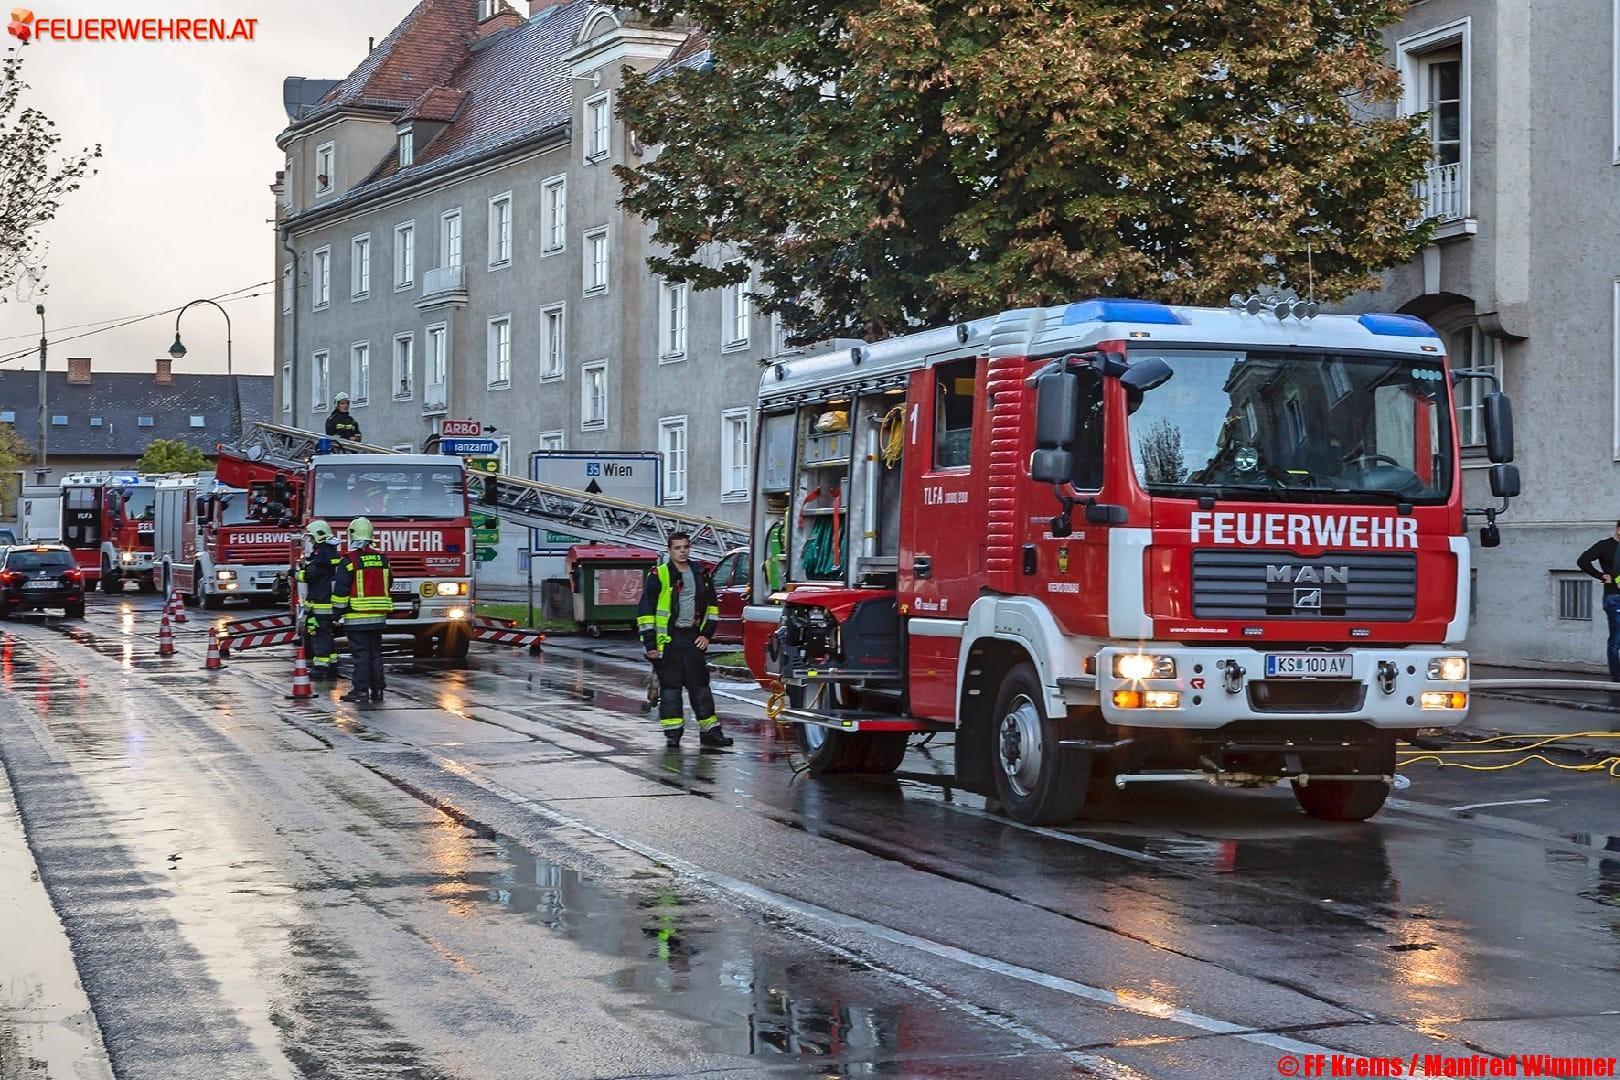 FF Krems / Manfred Wimmer